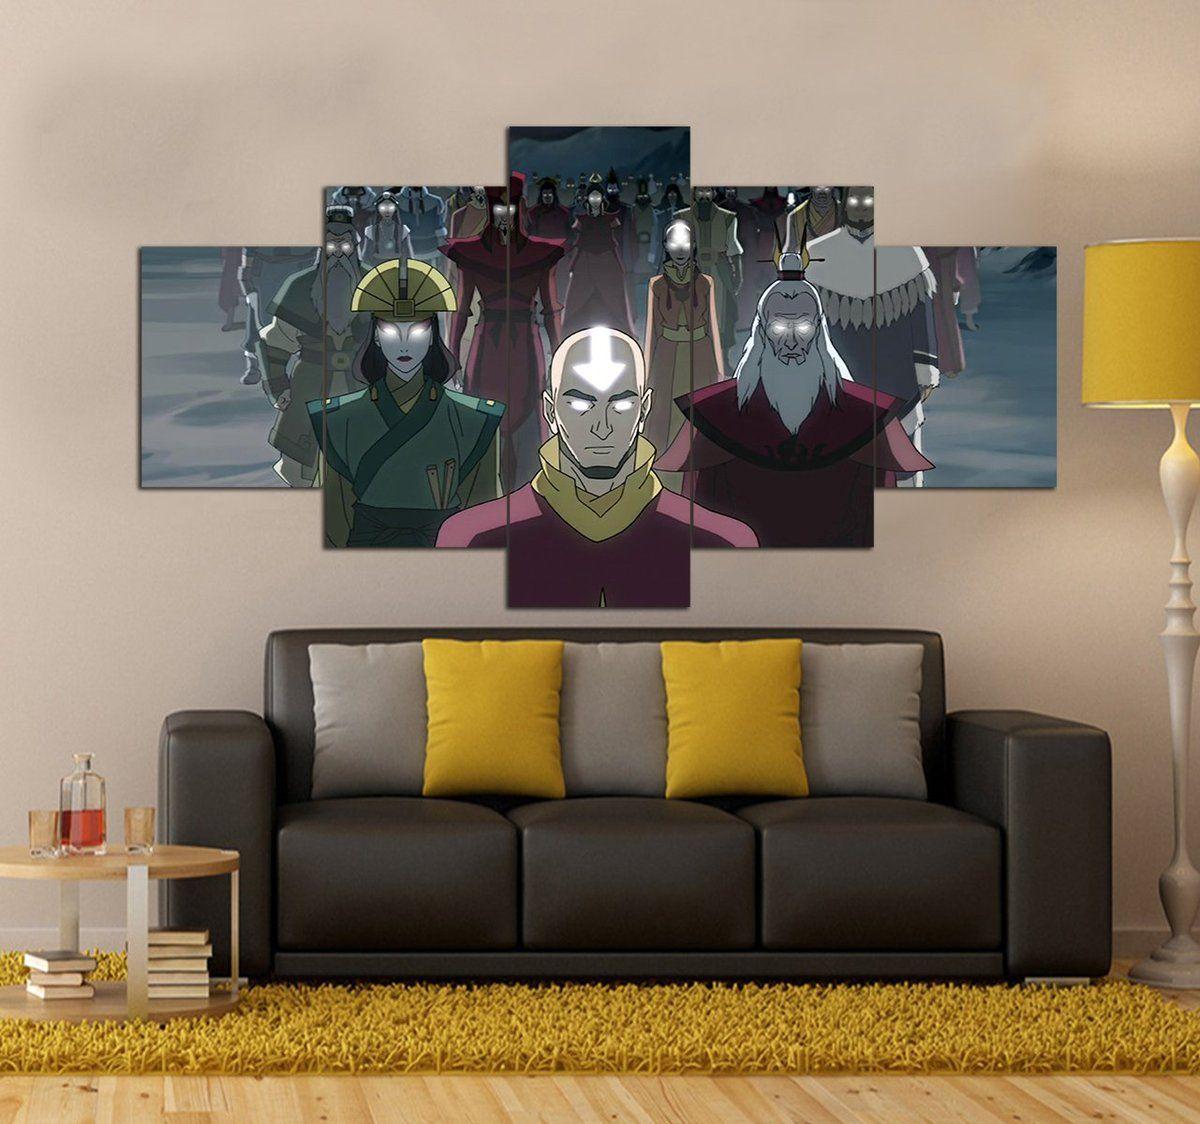 Avatar The Last Airbender Canvas Art Prints Set 5 Piece Canvas Art P 5 Piece Canvas Art Canvas Art Wall Decor Canvas Art Prints